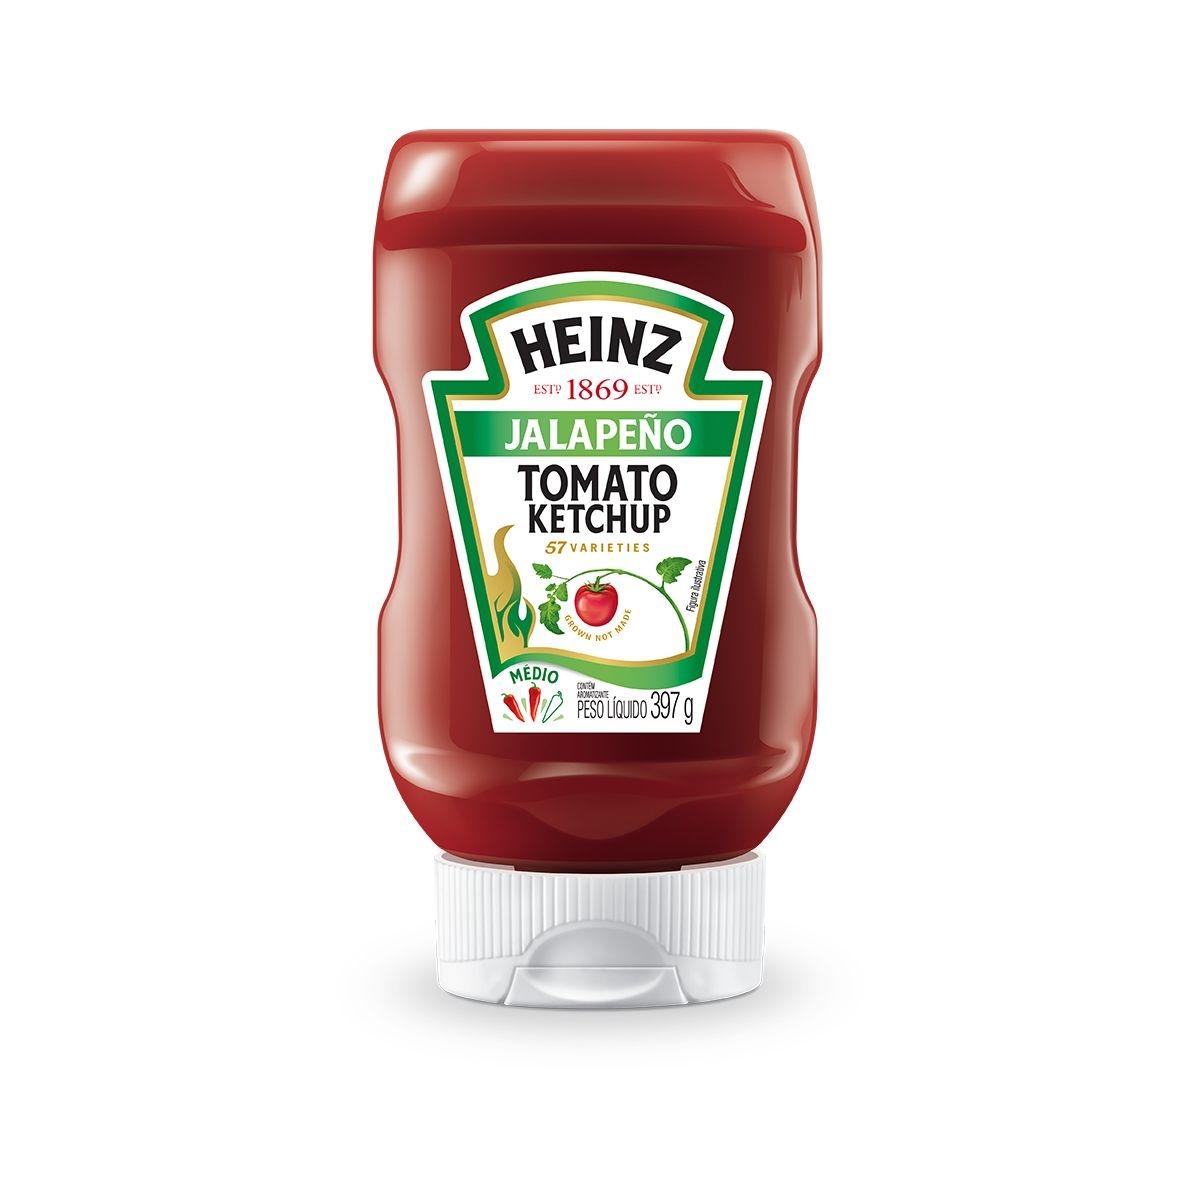 Ketchup Sabor Japaleño Heinz